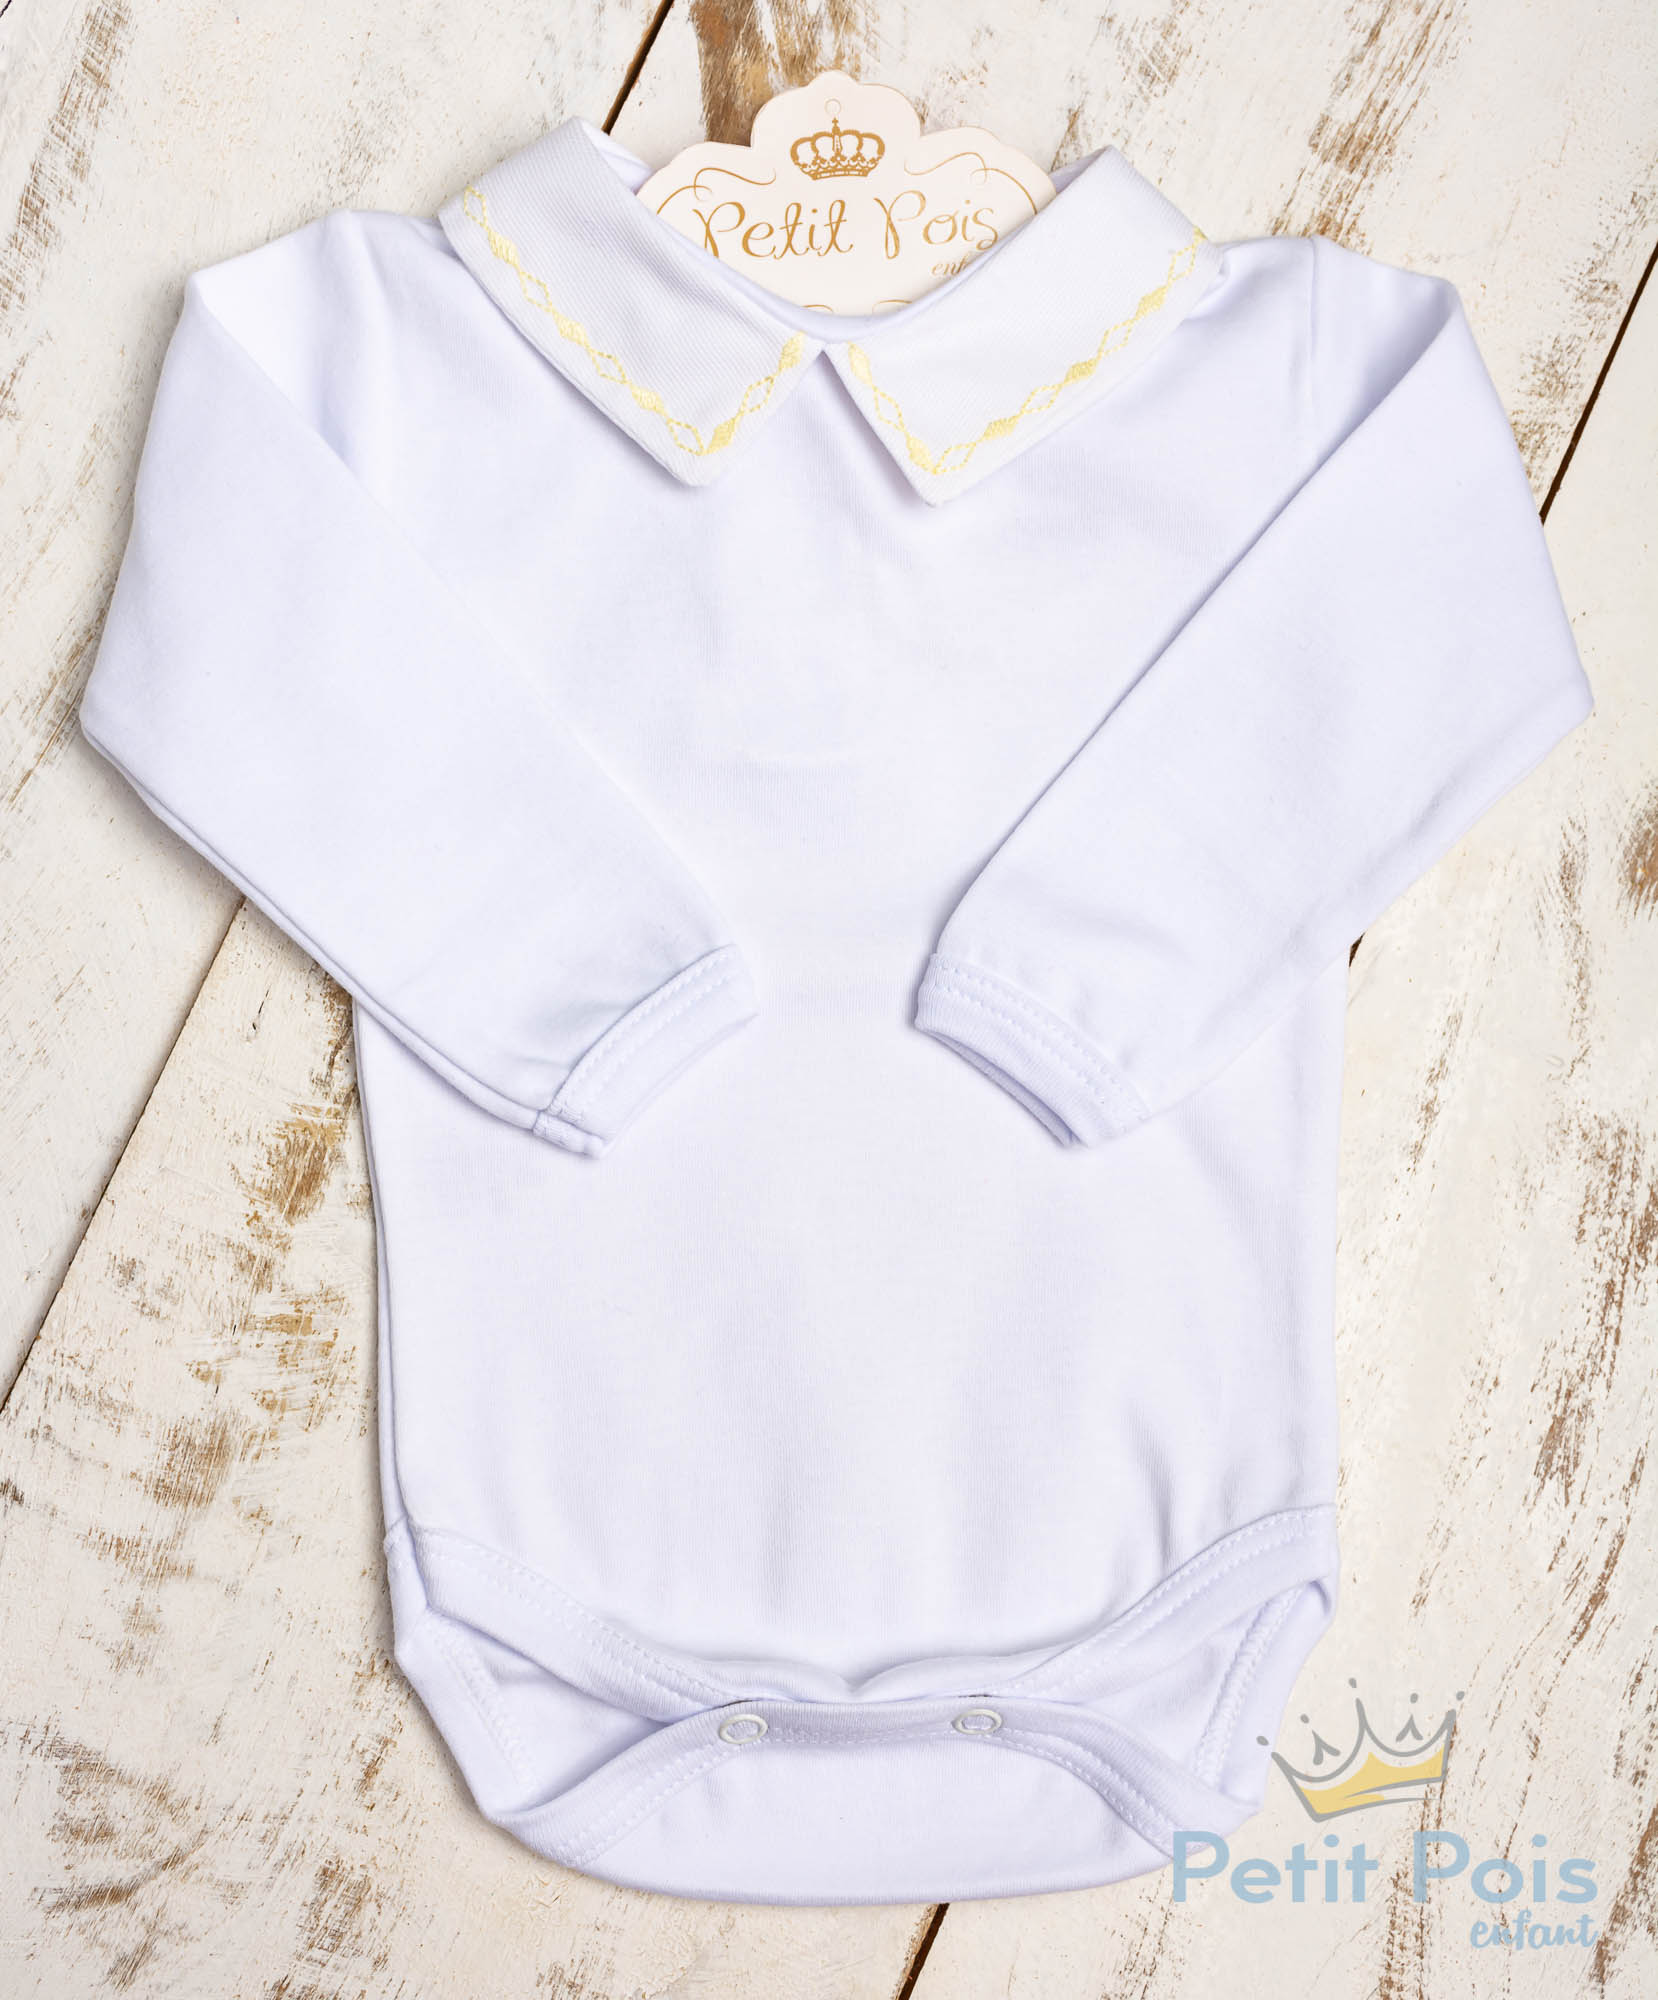 Body bebê corrente losango - Branco e amarelo